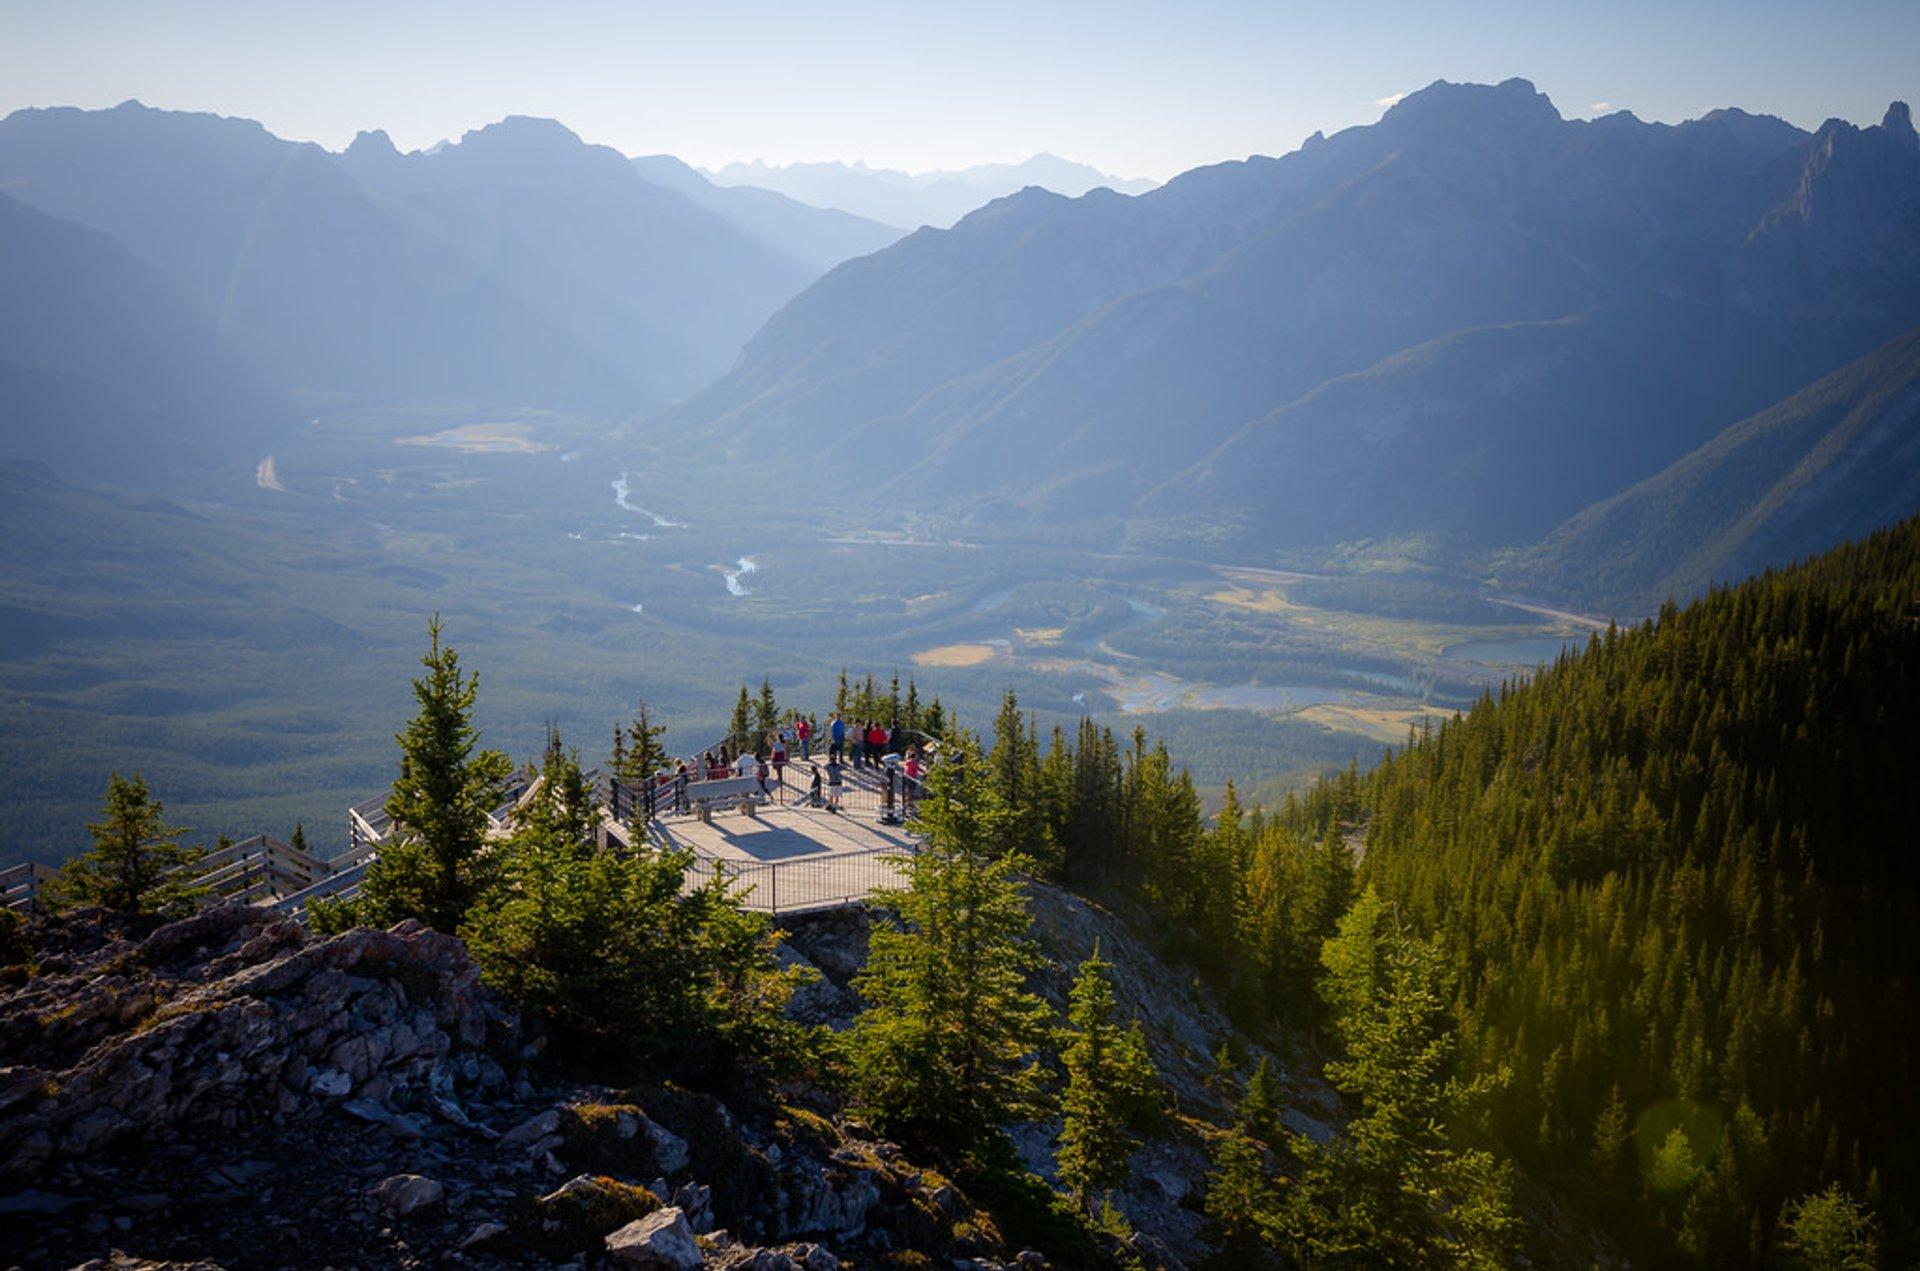 Best time to see Banff Gondola in Banff & Jasper National Parks 2020